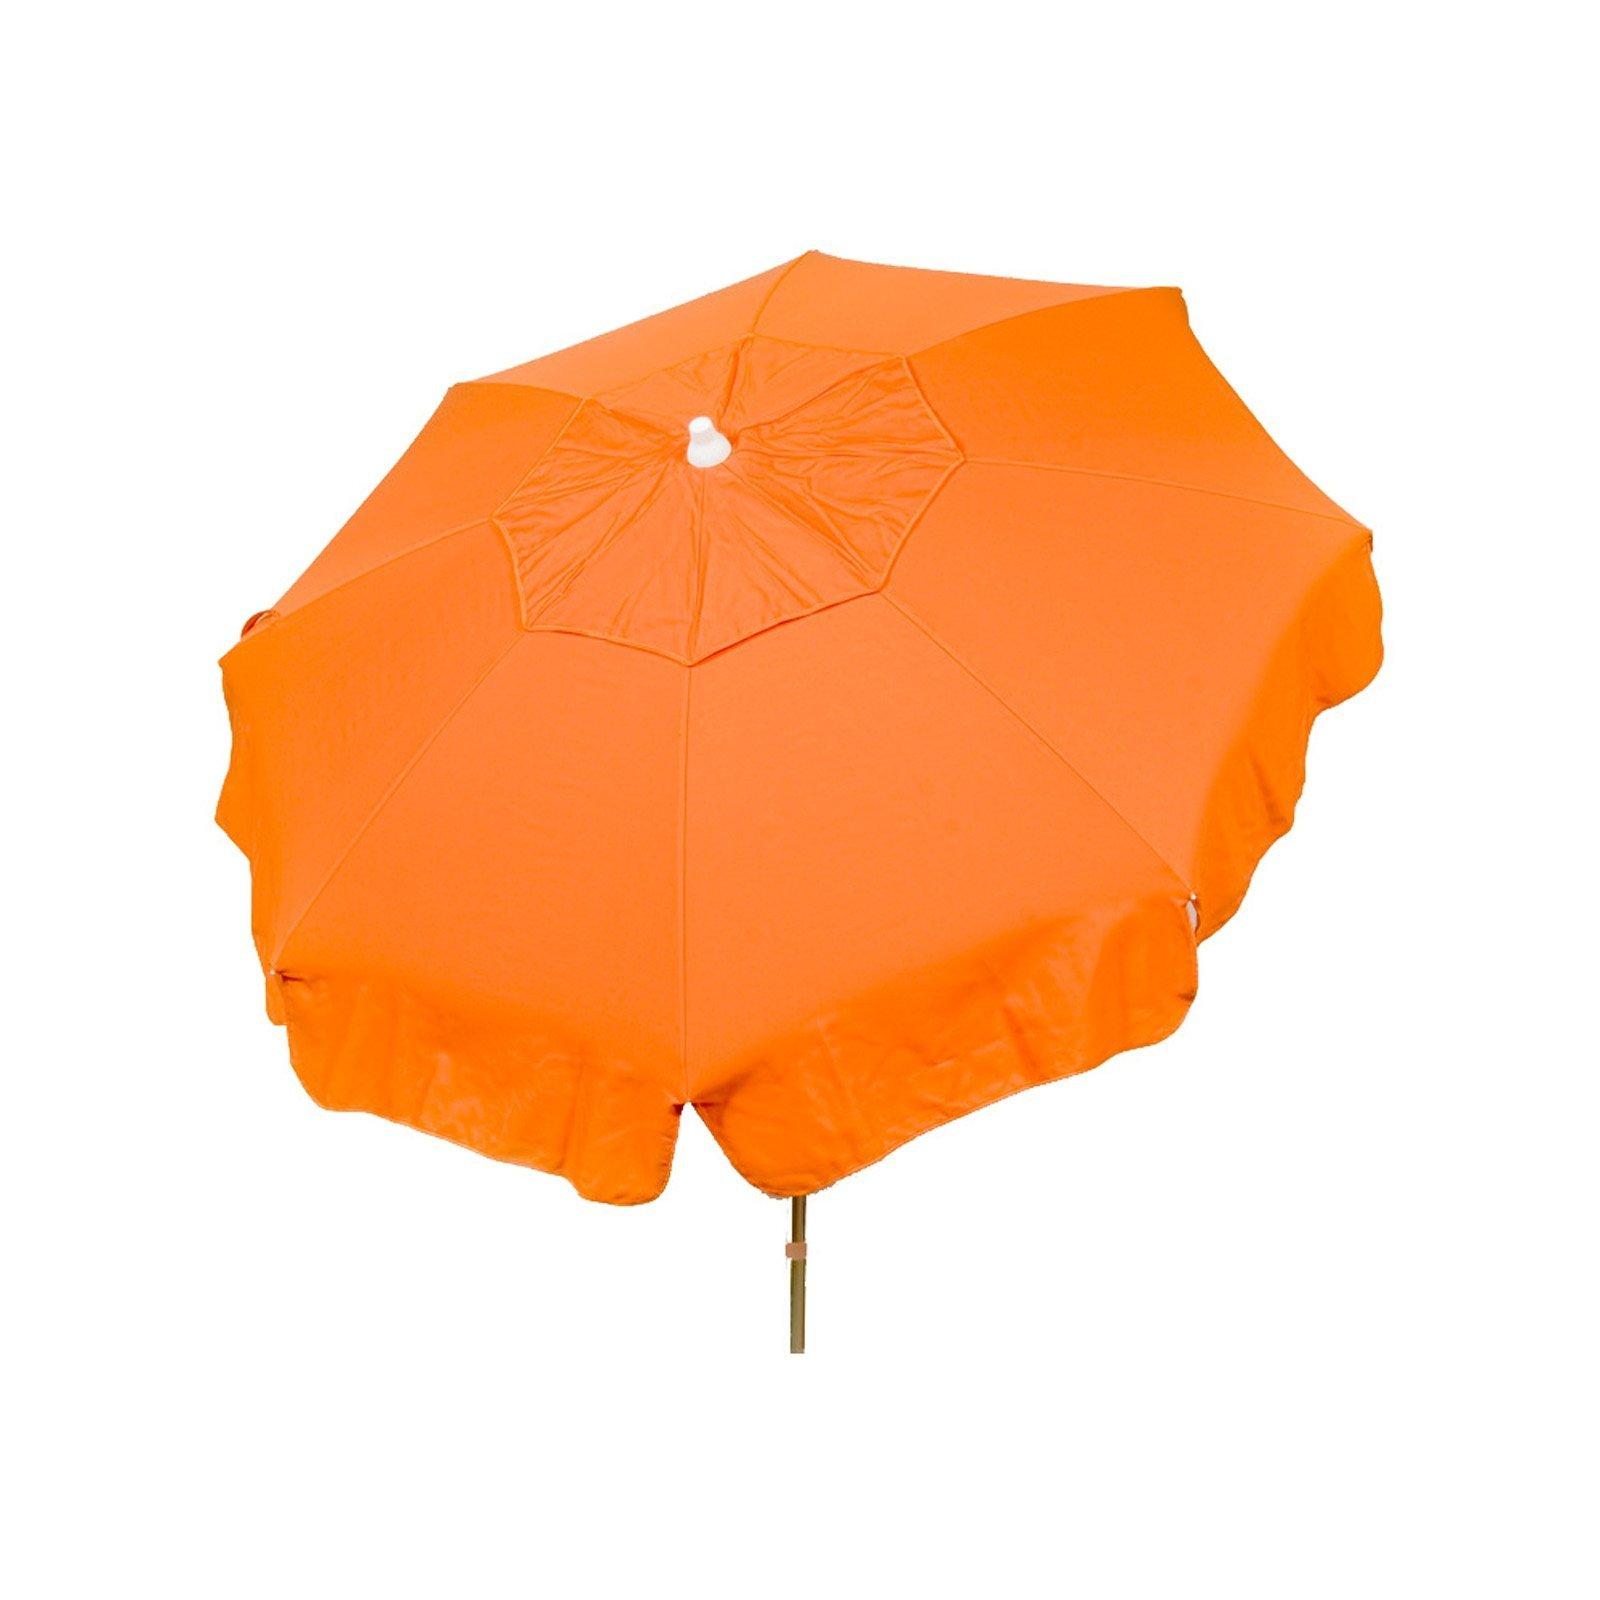 Italian 6 foot Push/Tilt Umbrella Acrylic Solid Orange - Patio Pole